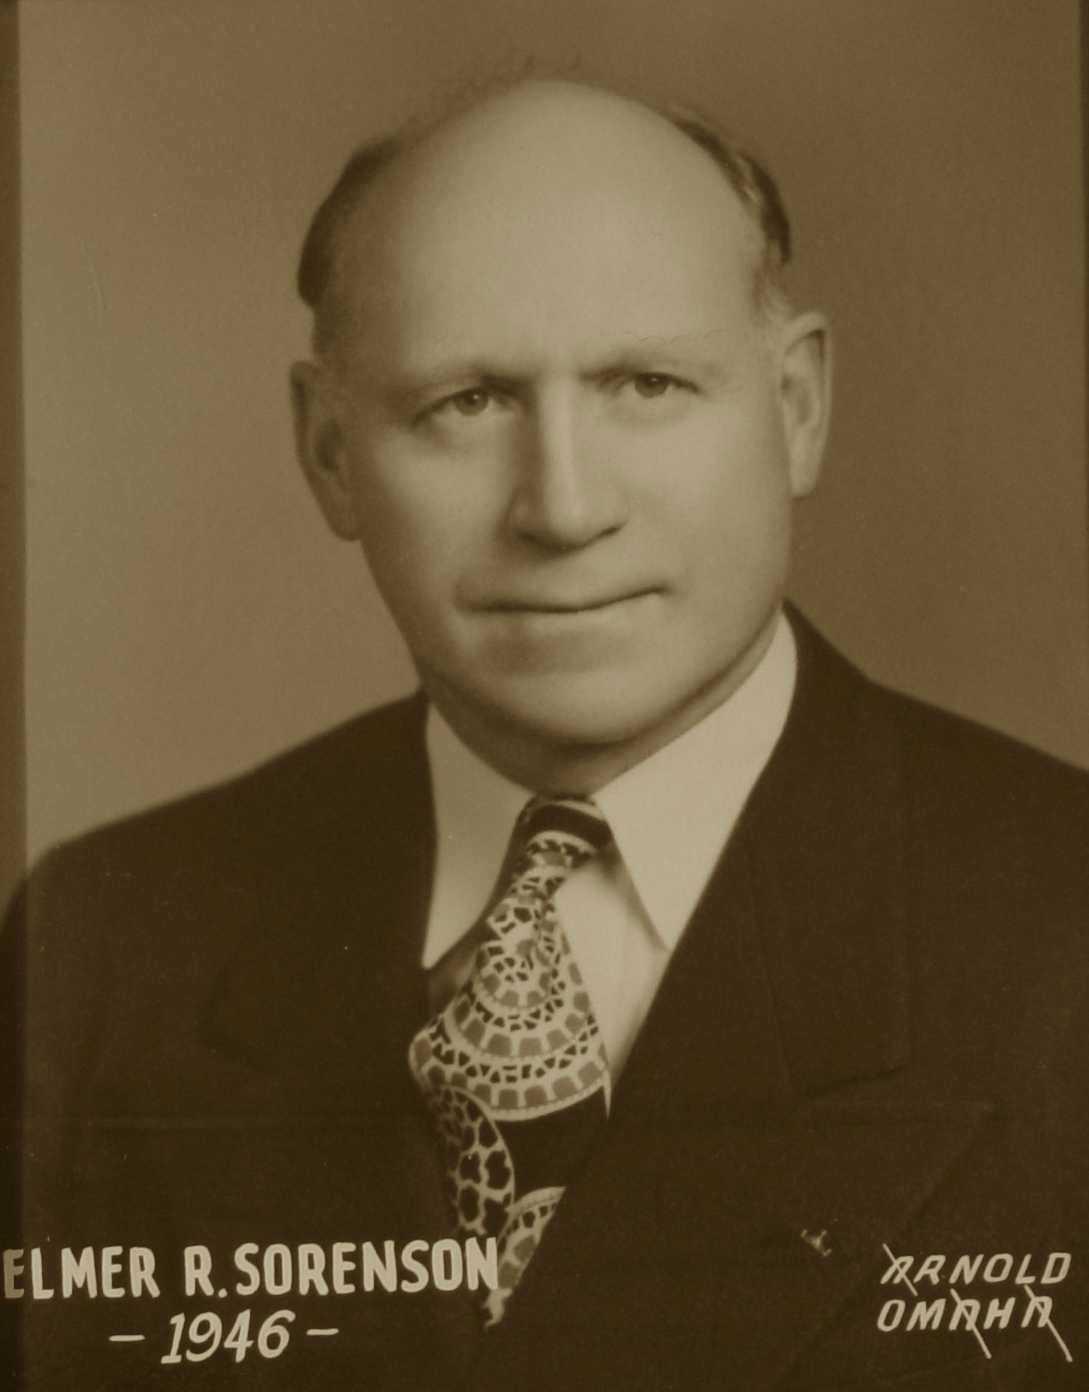 Elmer R. Sorenson, 1946